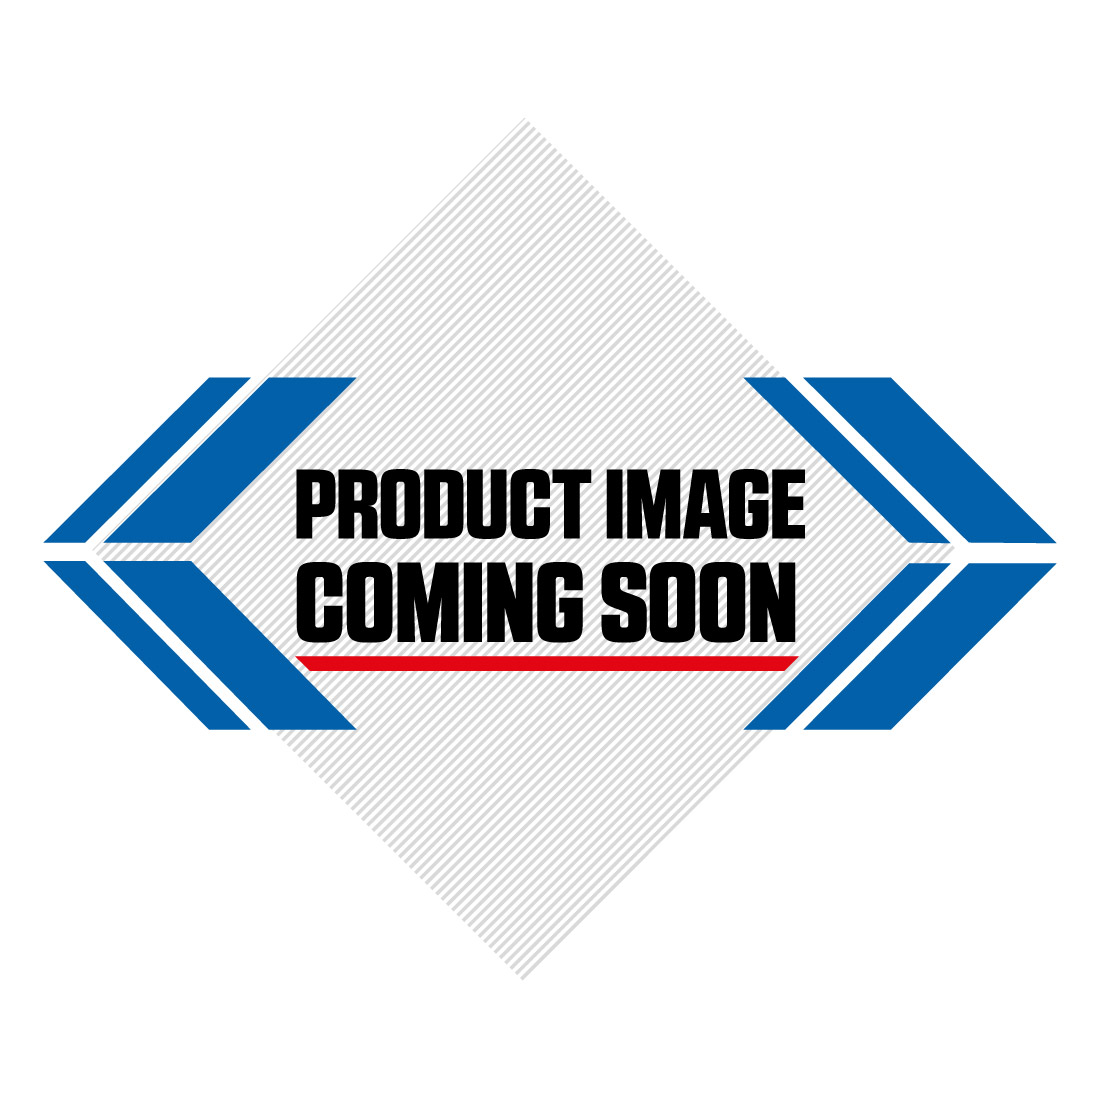 Suzuki Plastic Kit RMZ 450 (11-12) OEM Factory Image-1>